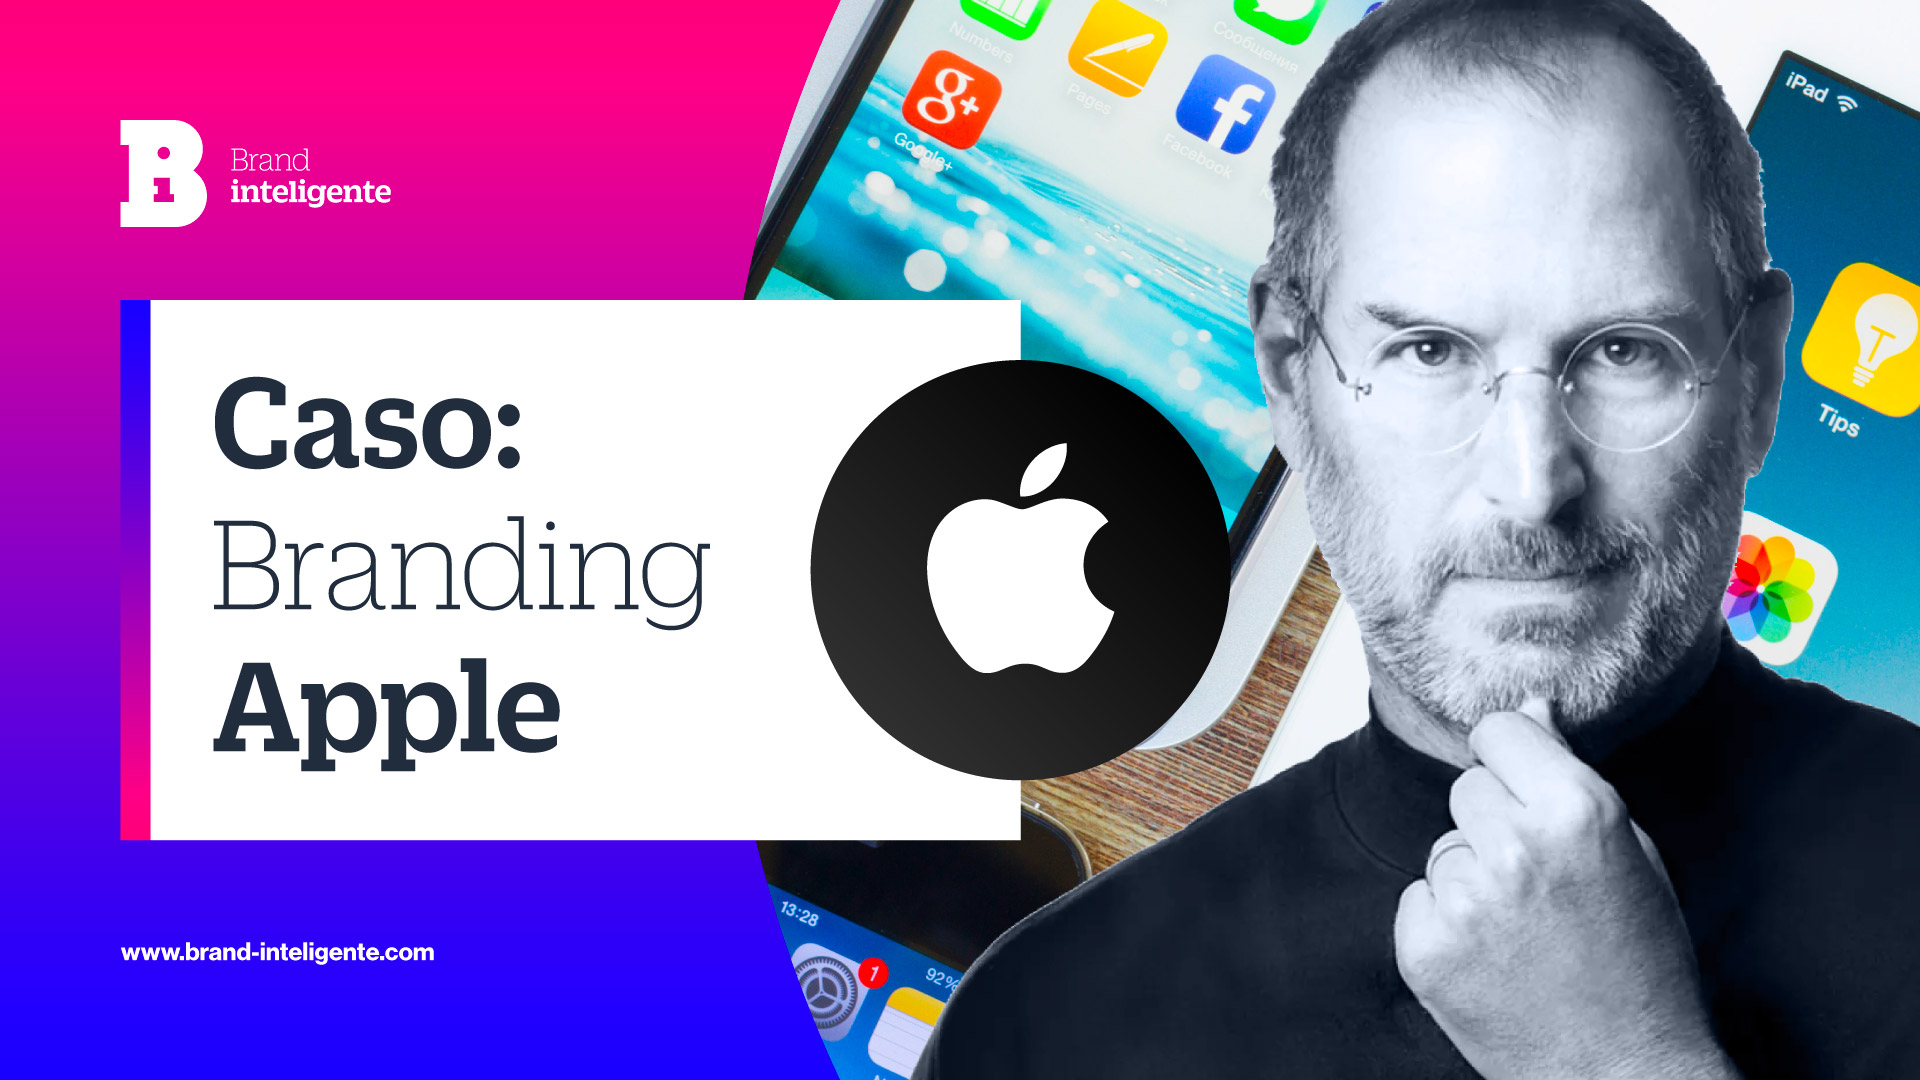 Caso Branding: Apple